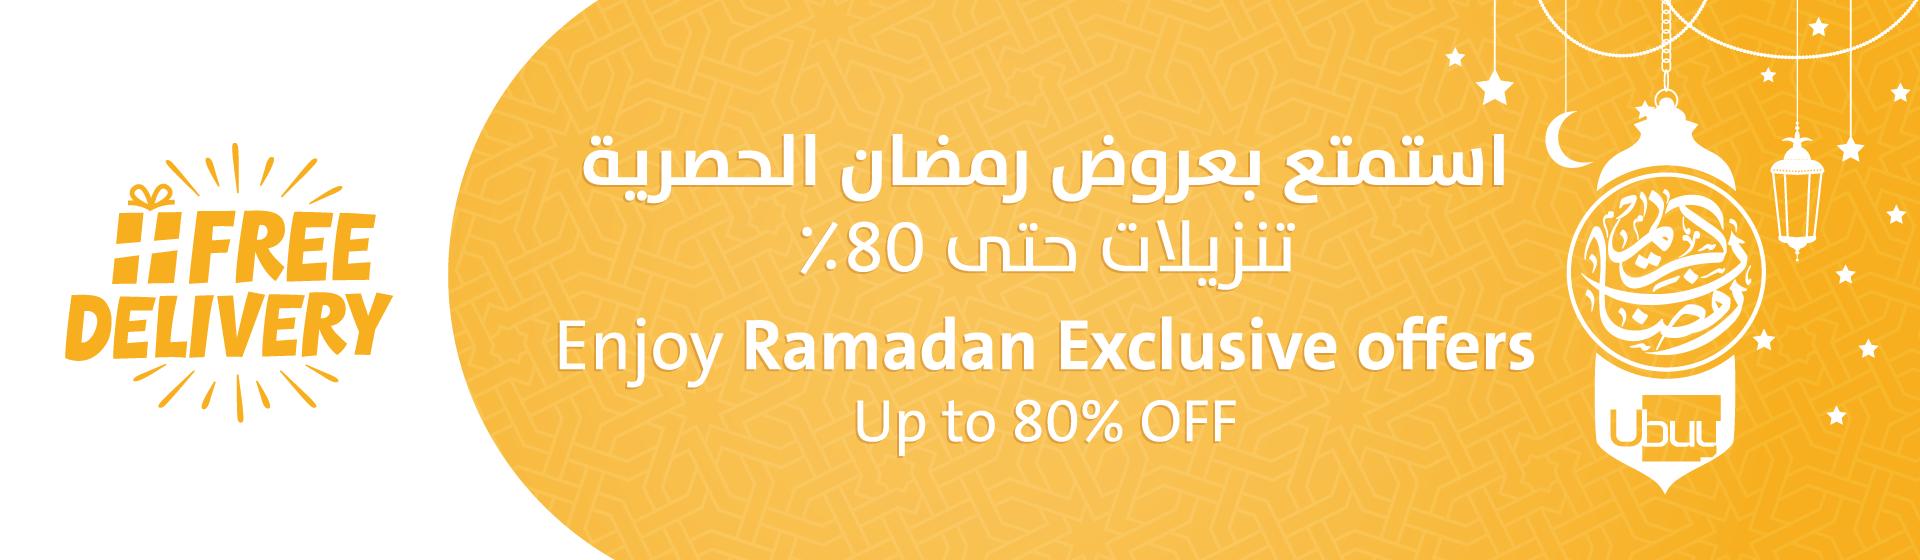 Ramadan Offers